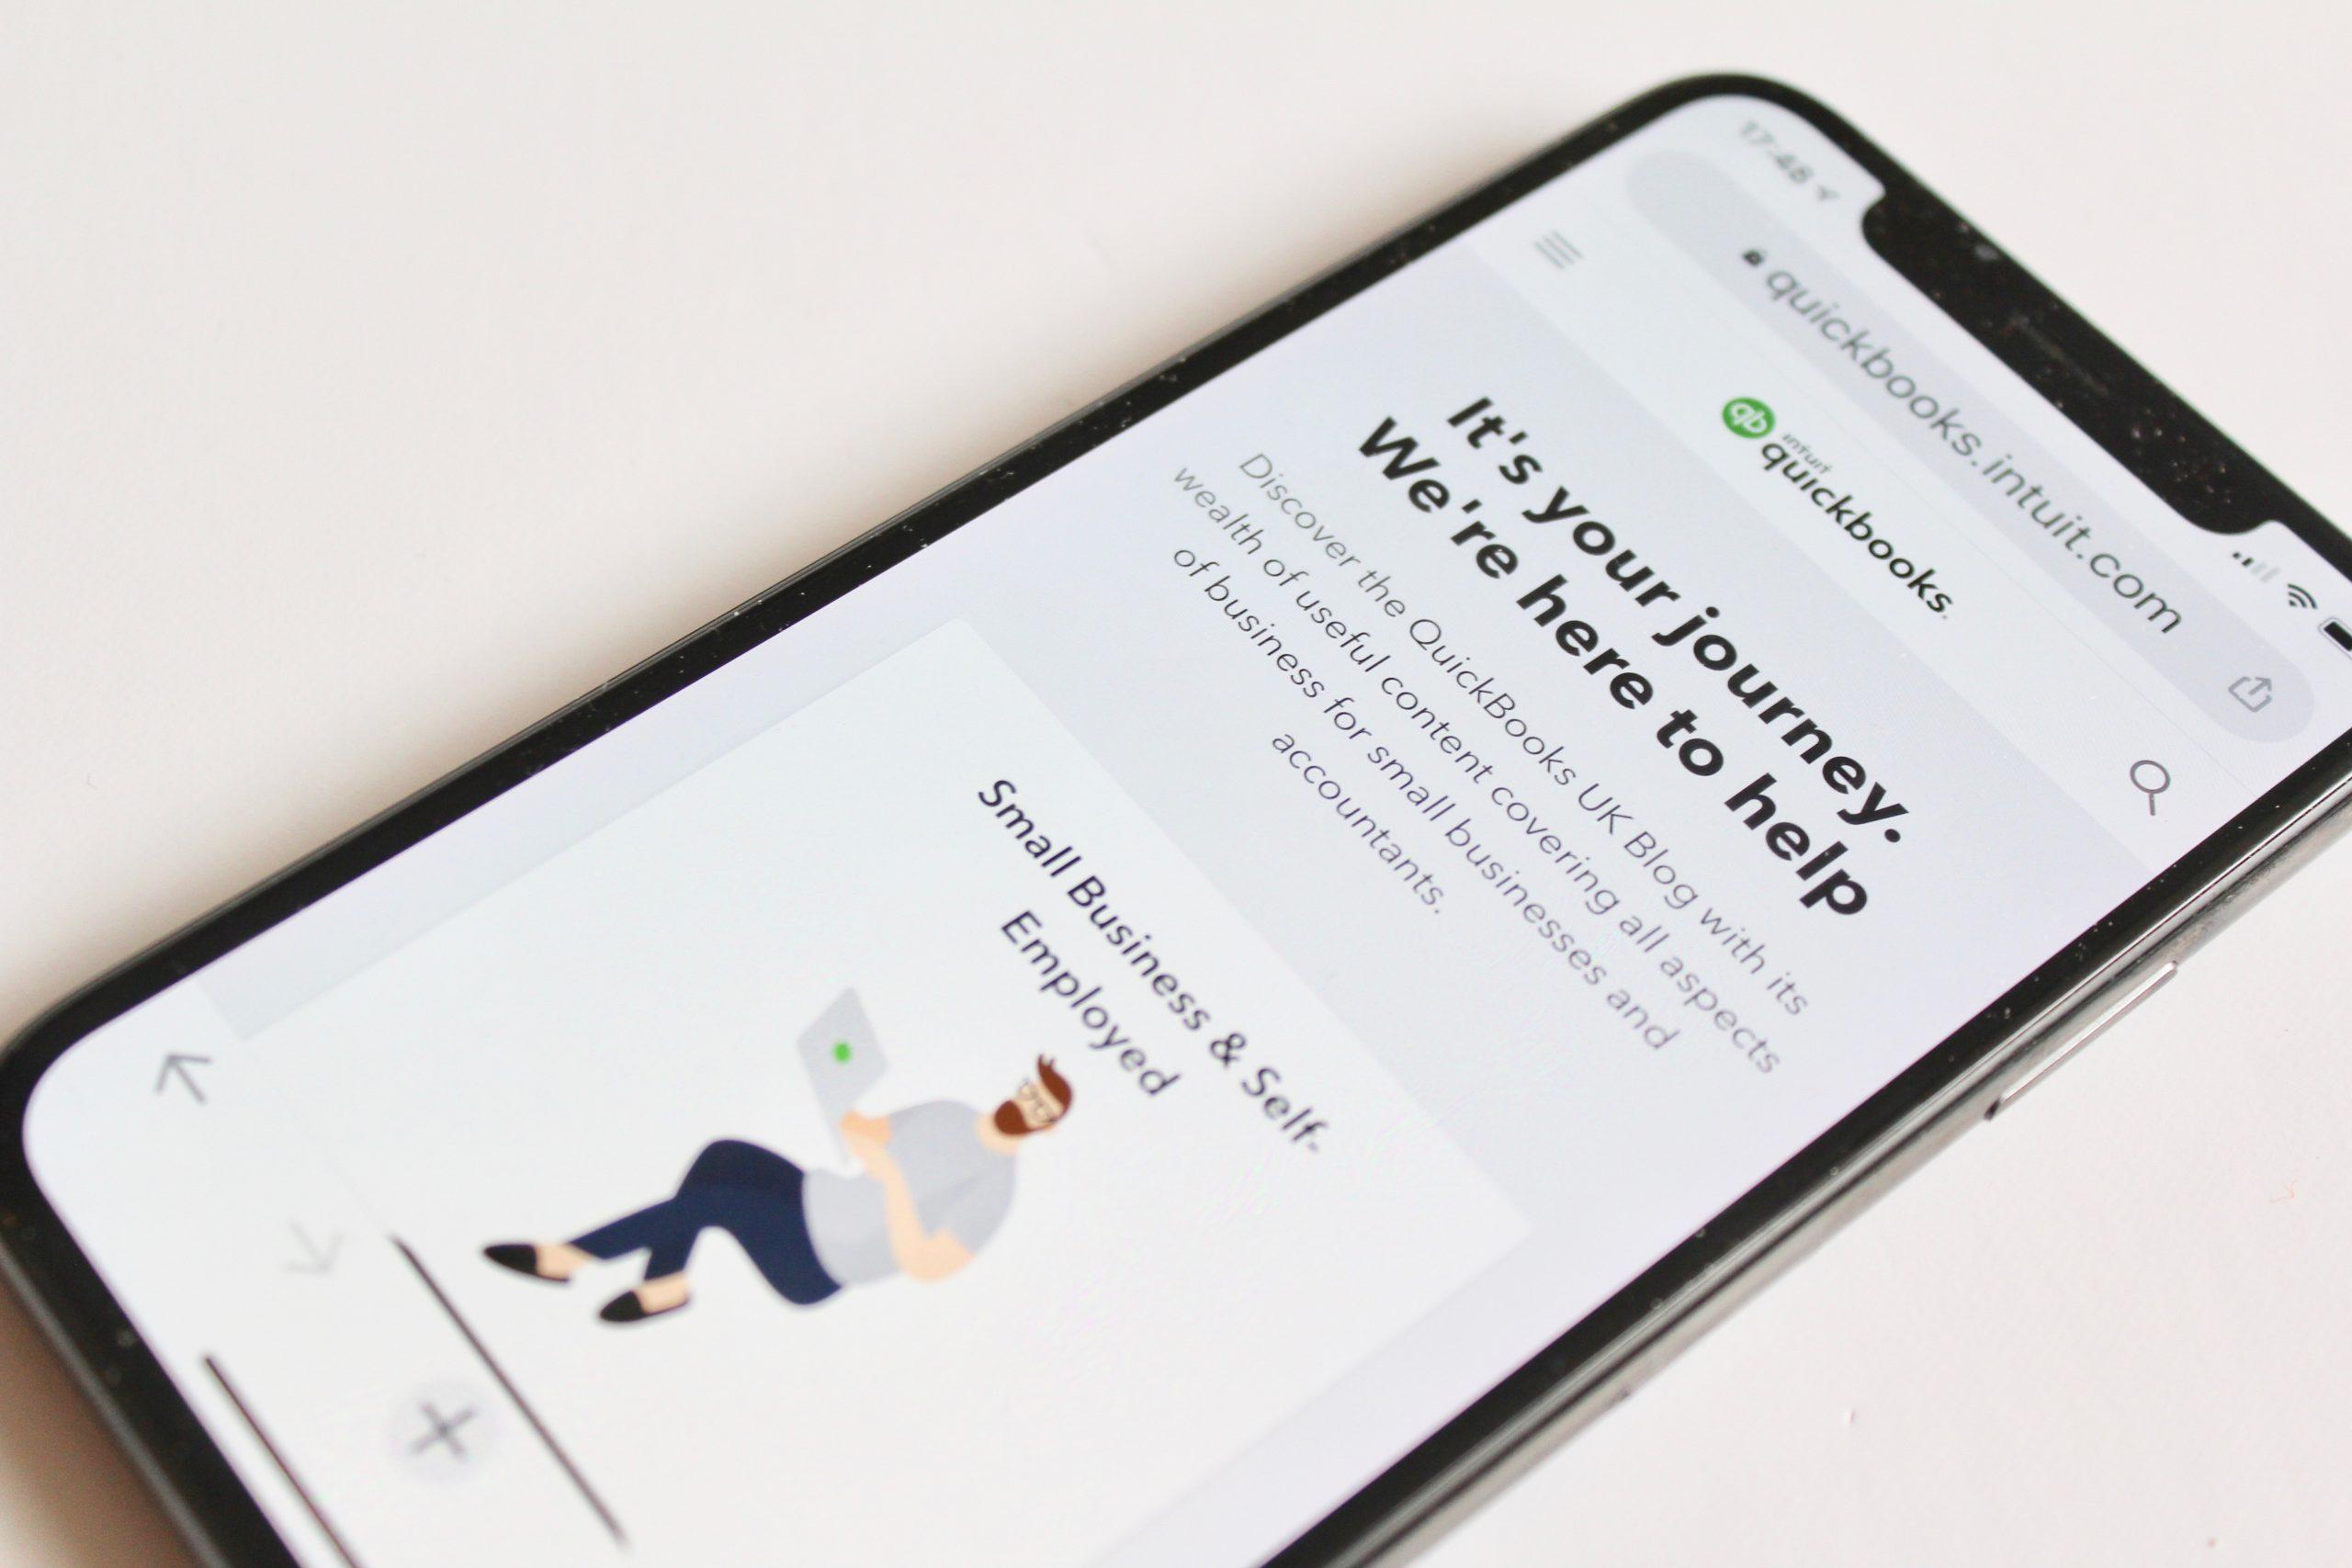 QuickBook blog on iPhone